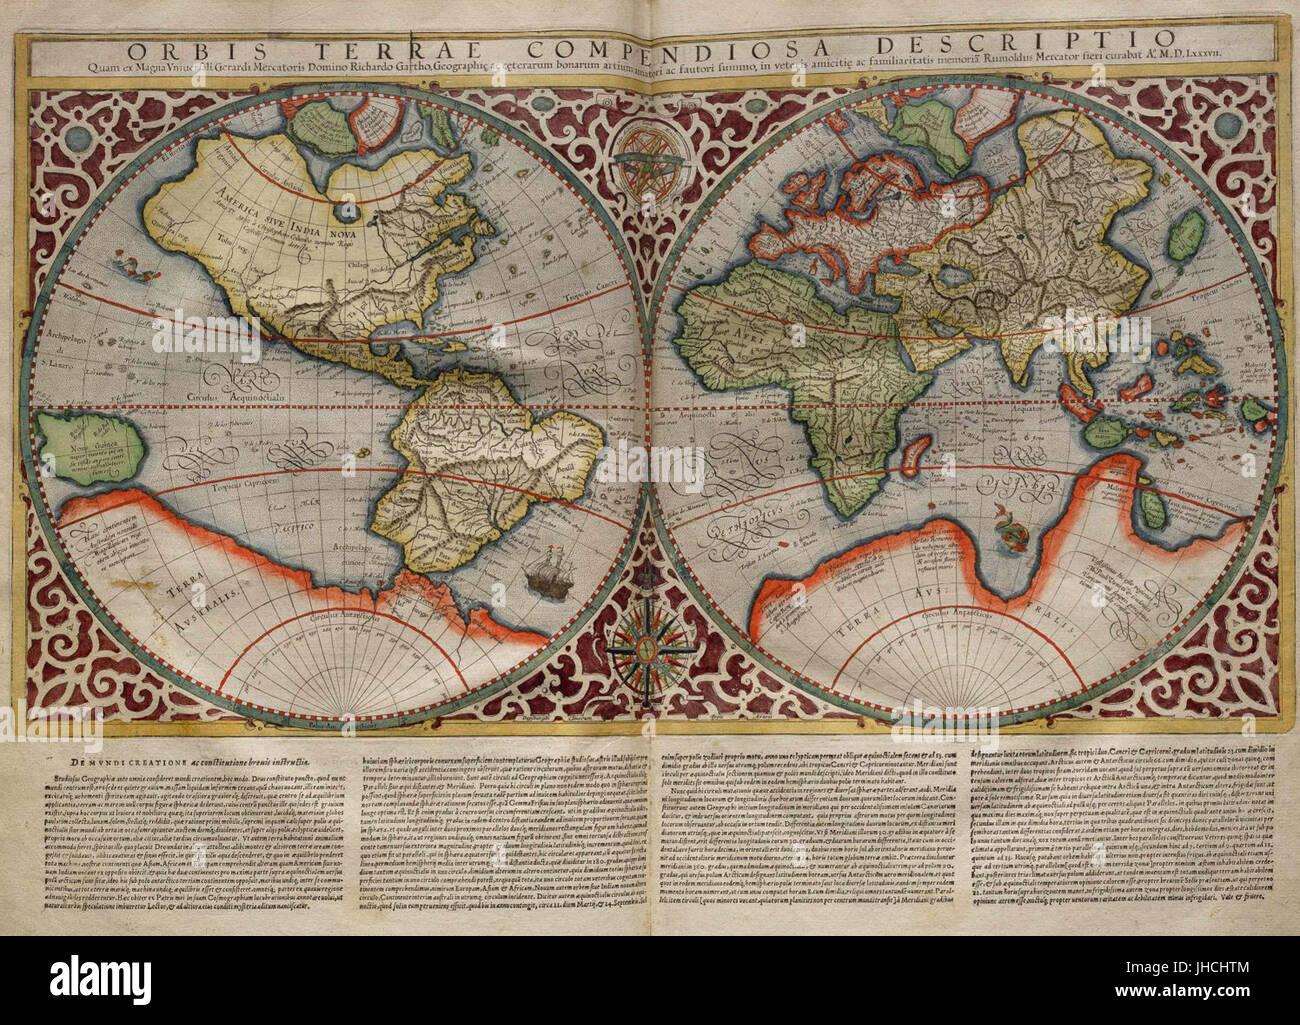 Mercator world map stock photo royalty free image 148409540 alamy mercator world map sciox Choice Image